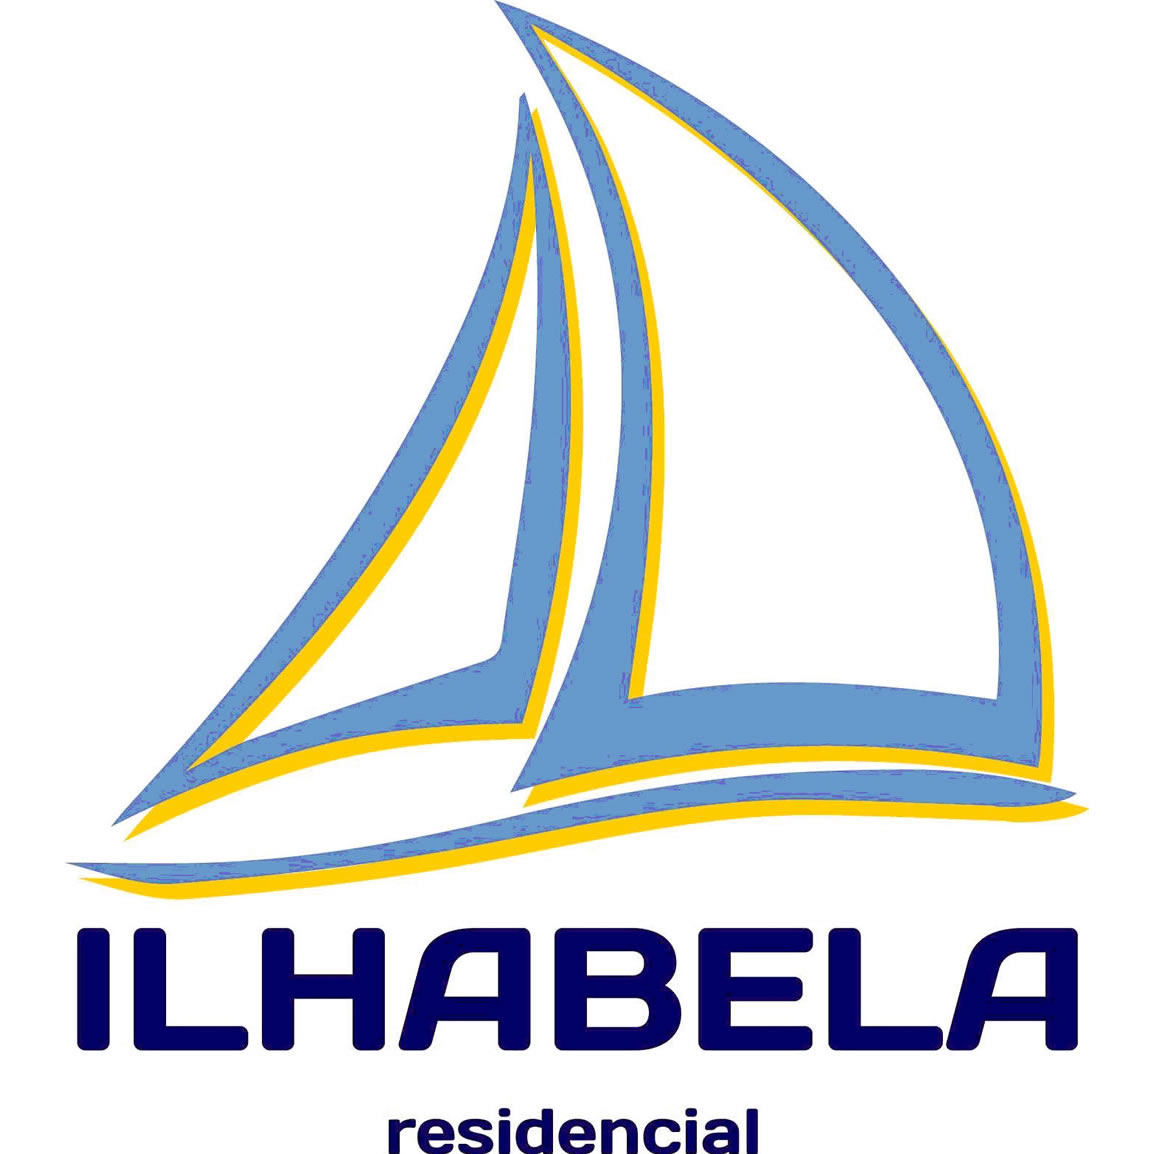 Residencial Ilhabela